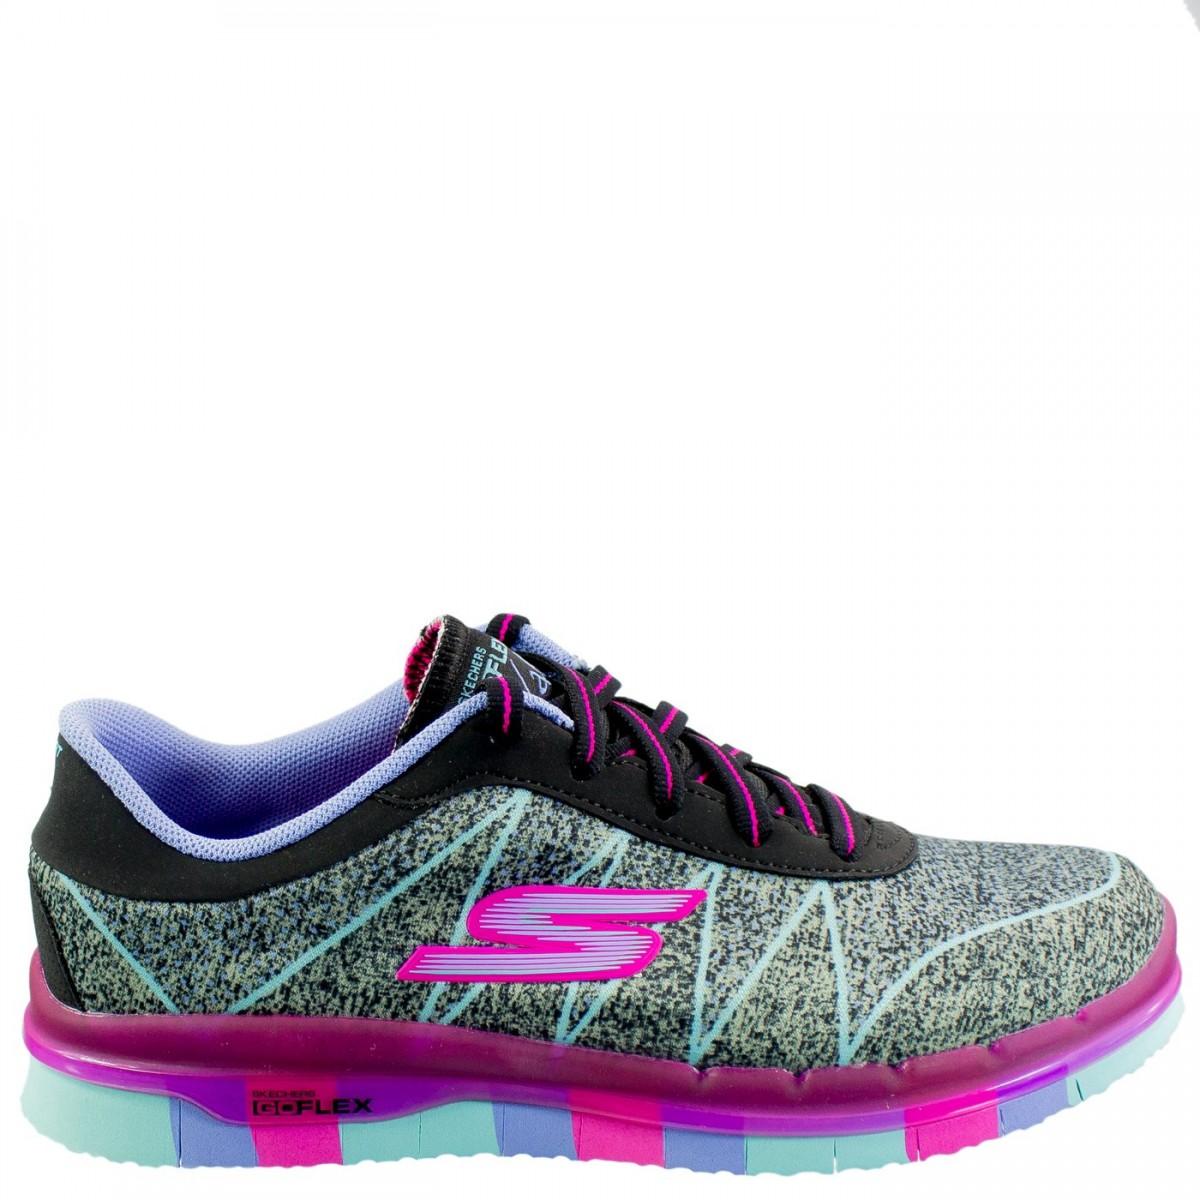 351e4b12670 Bizz Store - Tênis Infantil Feminino Skechers GO Flex Ability